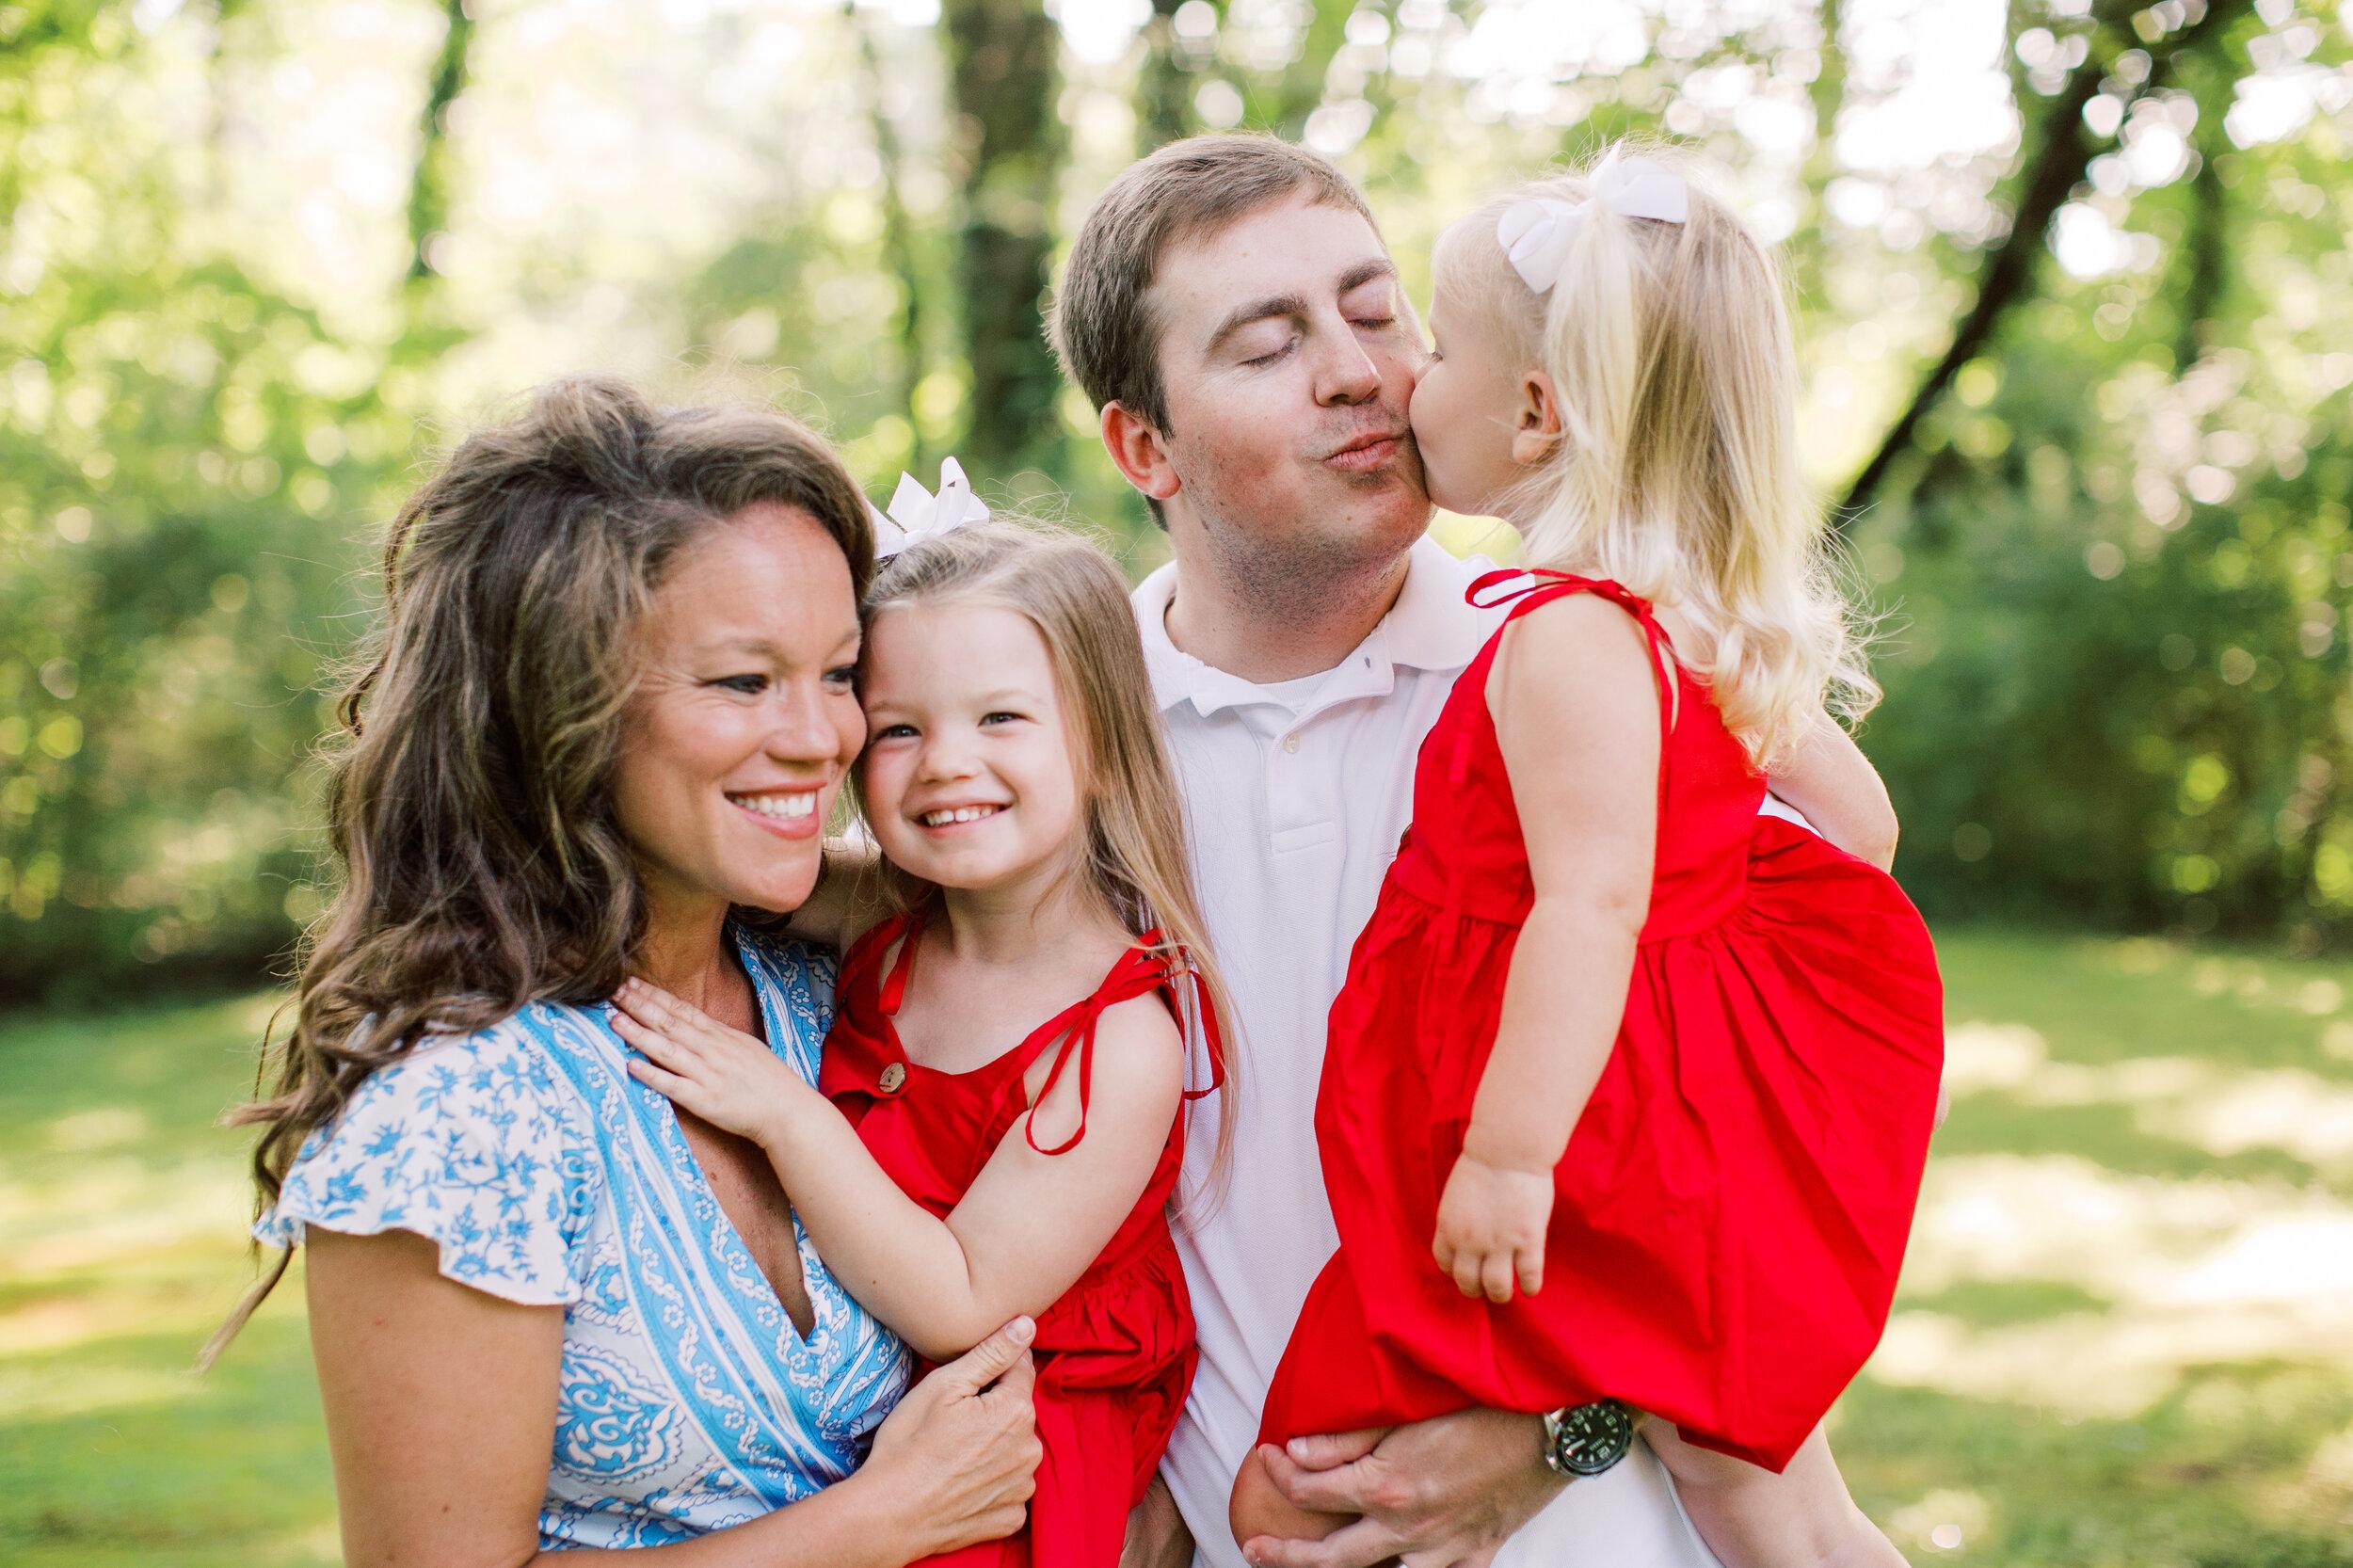 Clarke_Family_Mini_Abigail_Malone_Photography_Knoxville-74.jpg